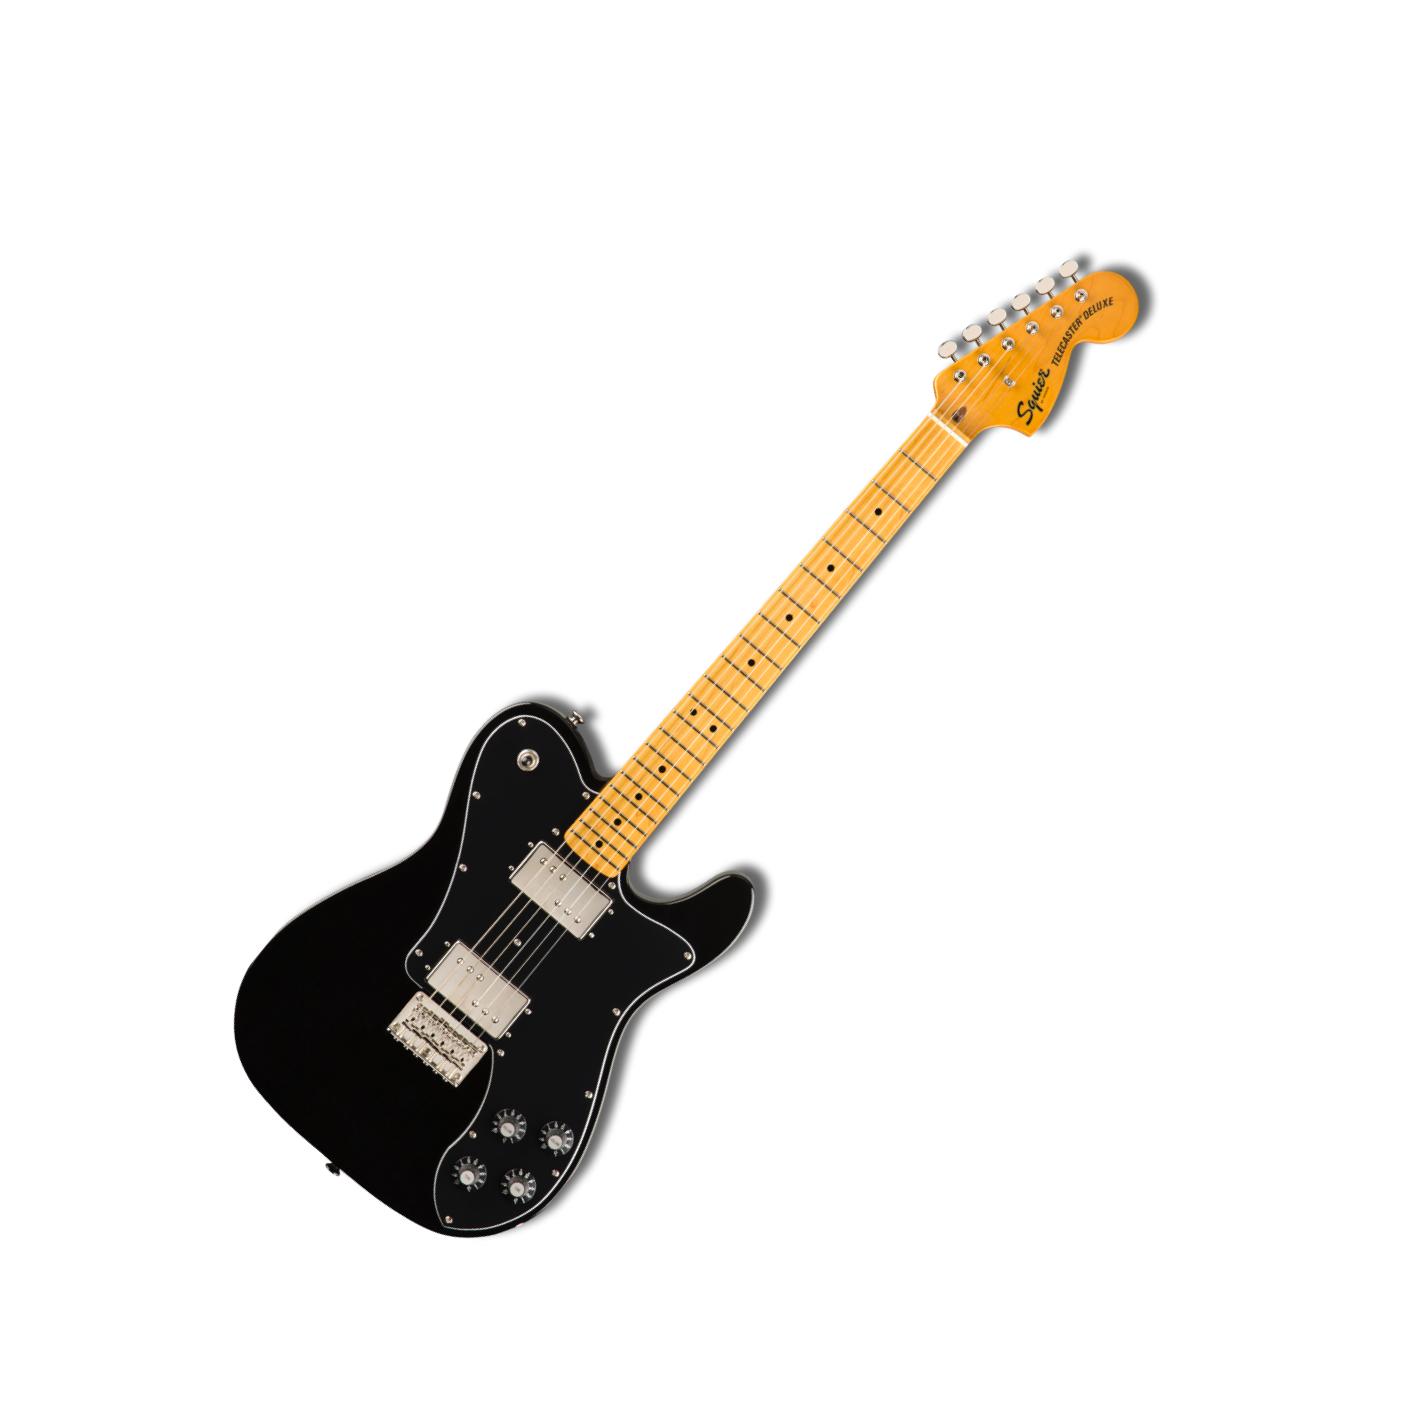 Fender Squier Classic Vibe 70s tele in black